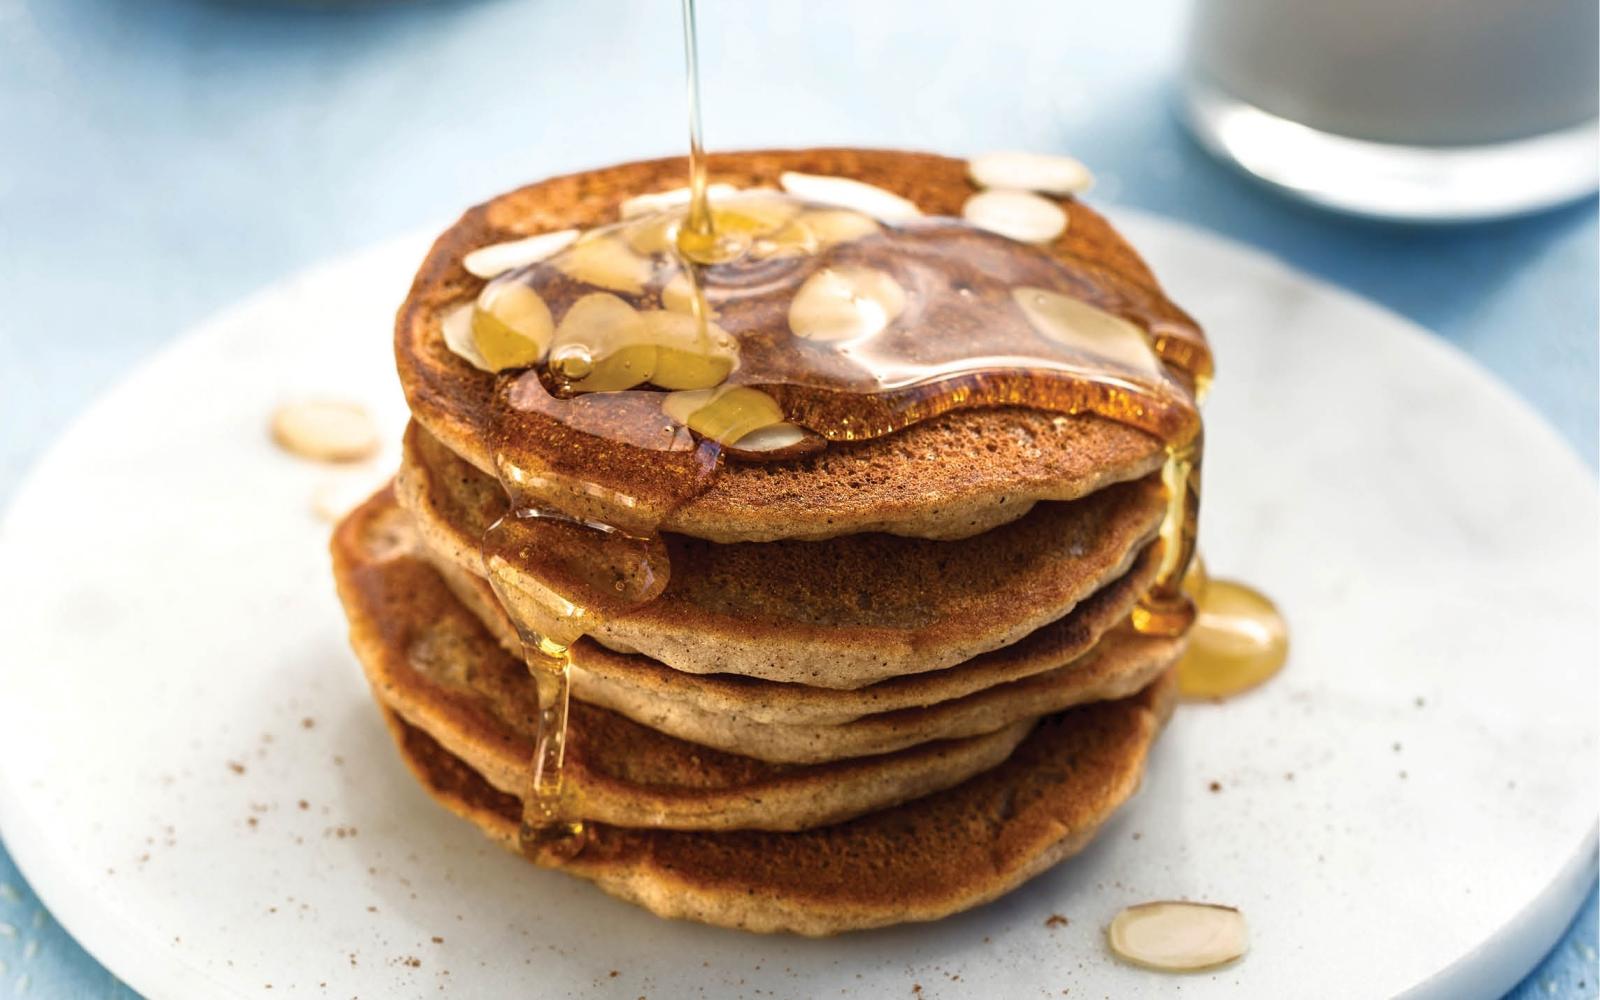 horchata-flavored mochi pancakes